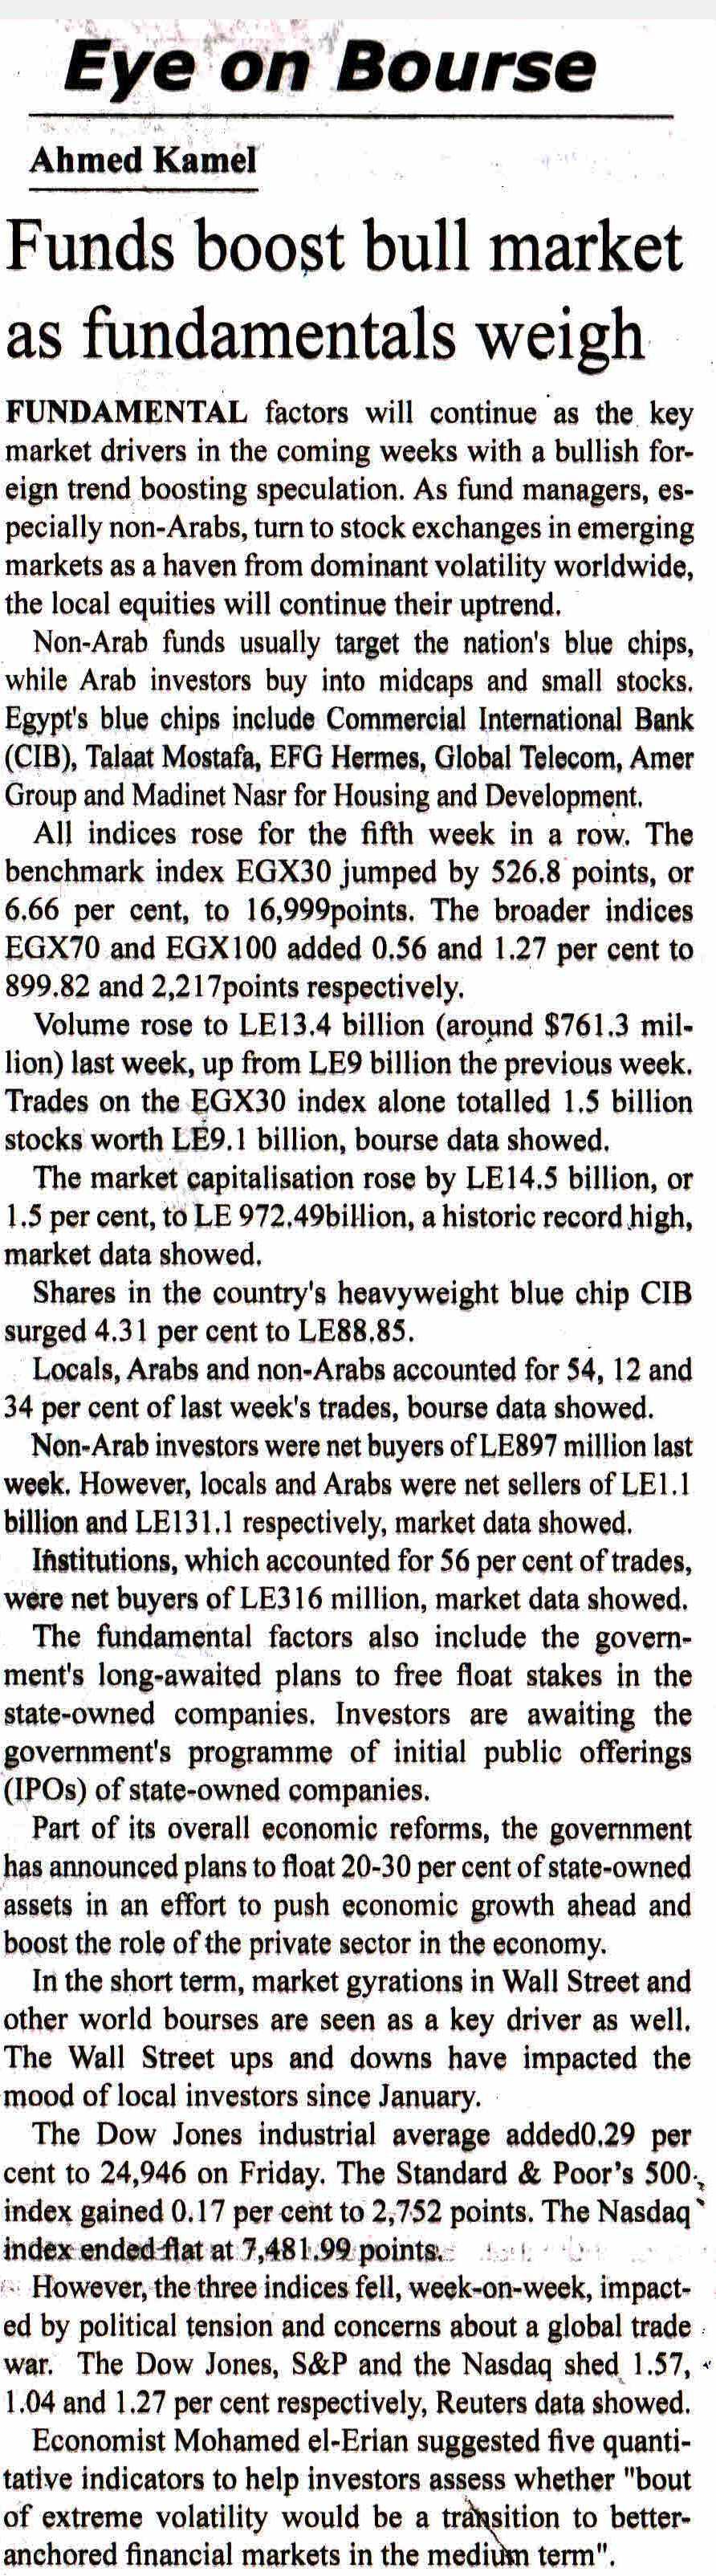 The Egyptian Gazette 18 March P.2.jpg